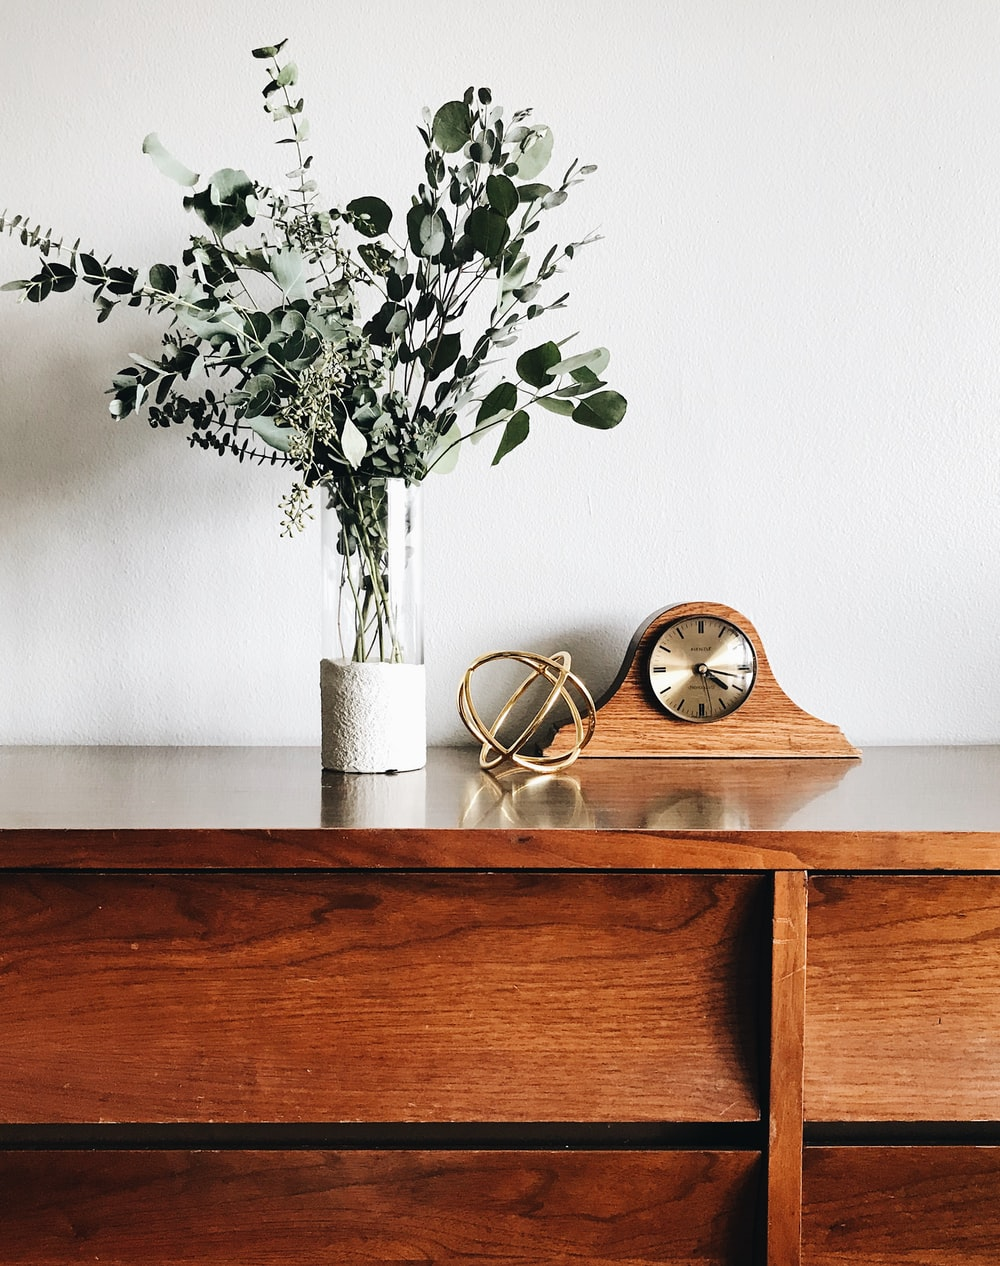 brown wooden framed analog mantle clock near gray petaled flower centerpiece